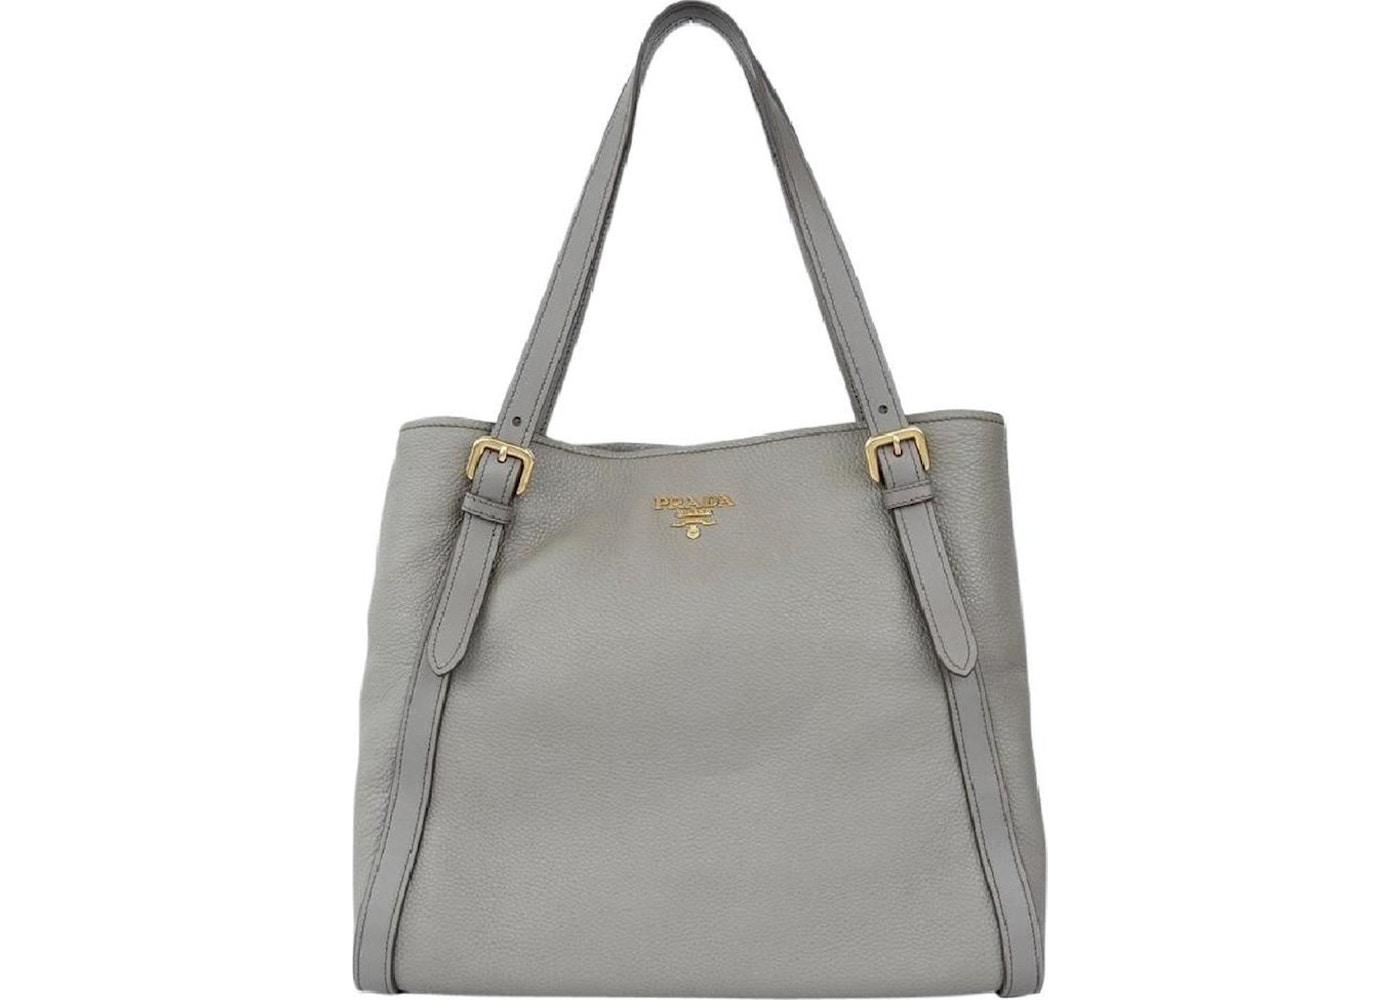 961be2aa184a Sell. or Ask. View All Bids. Prada Vitello Phenix Tote Bag Gray